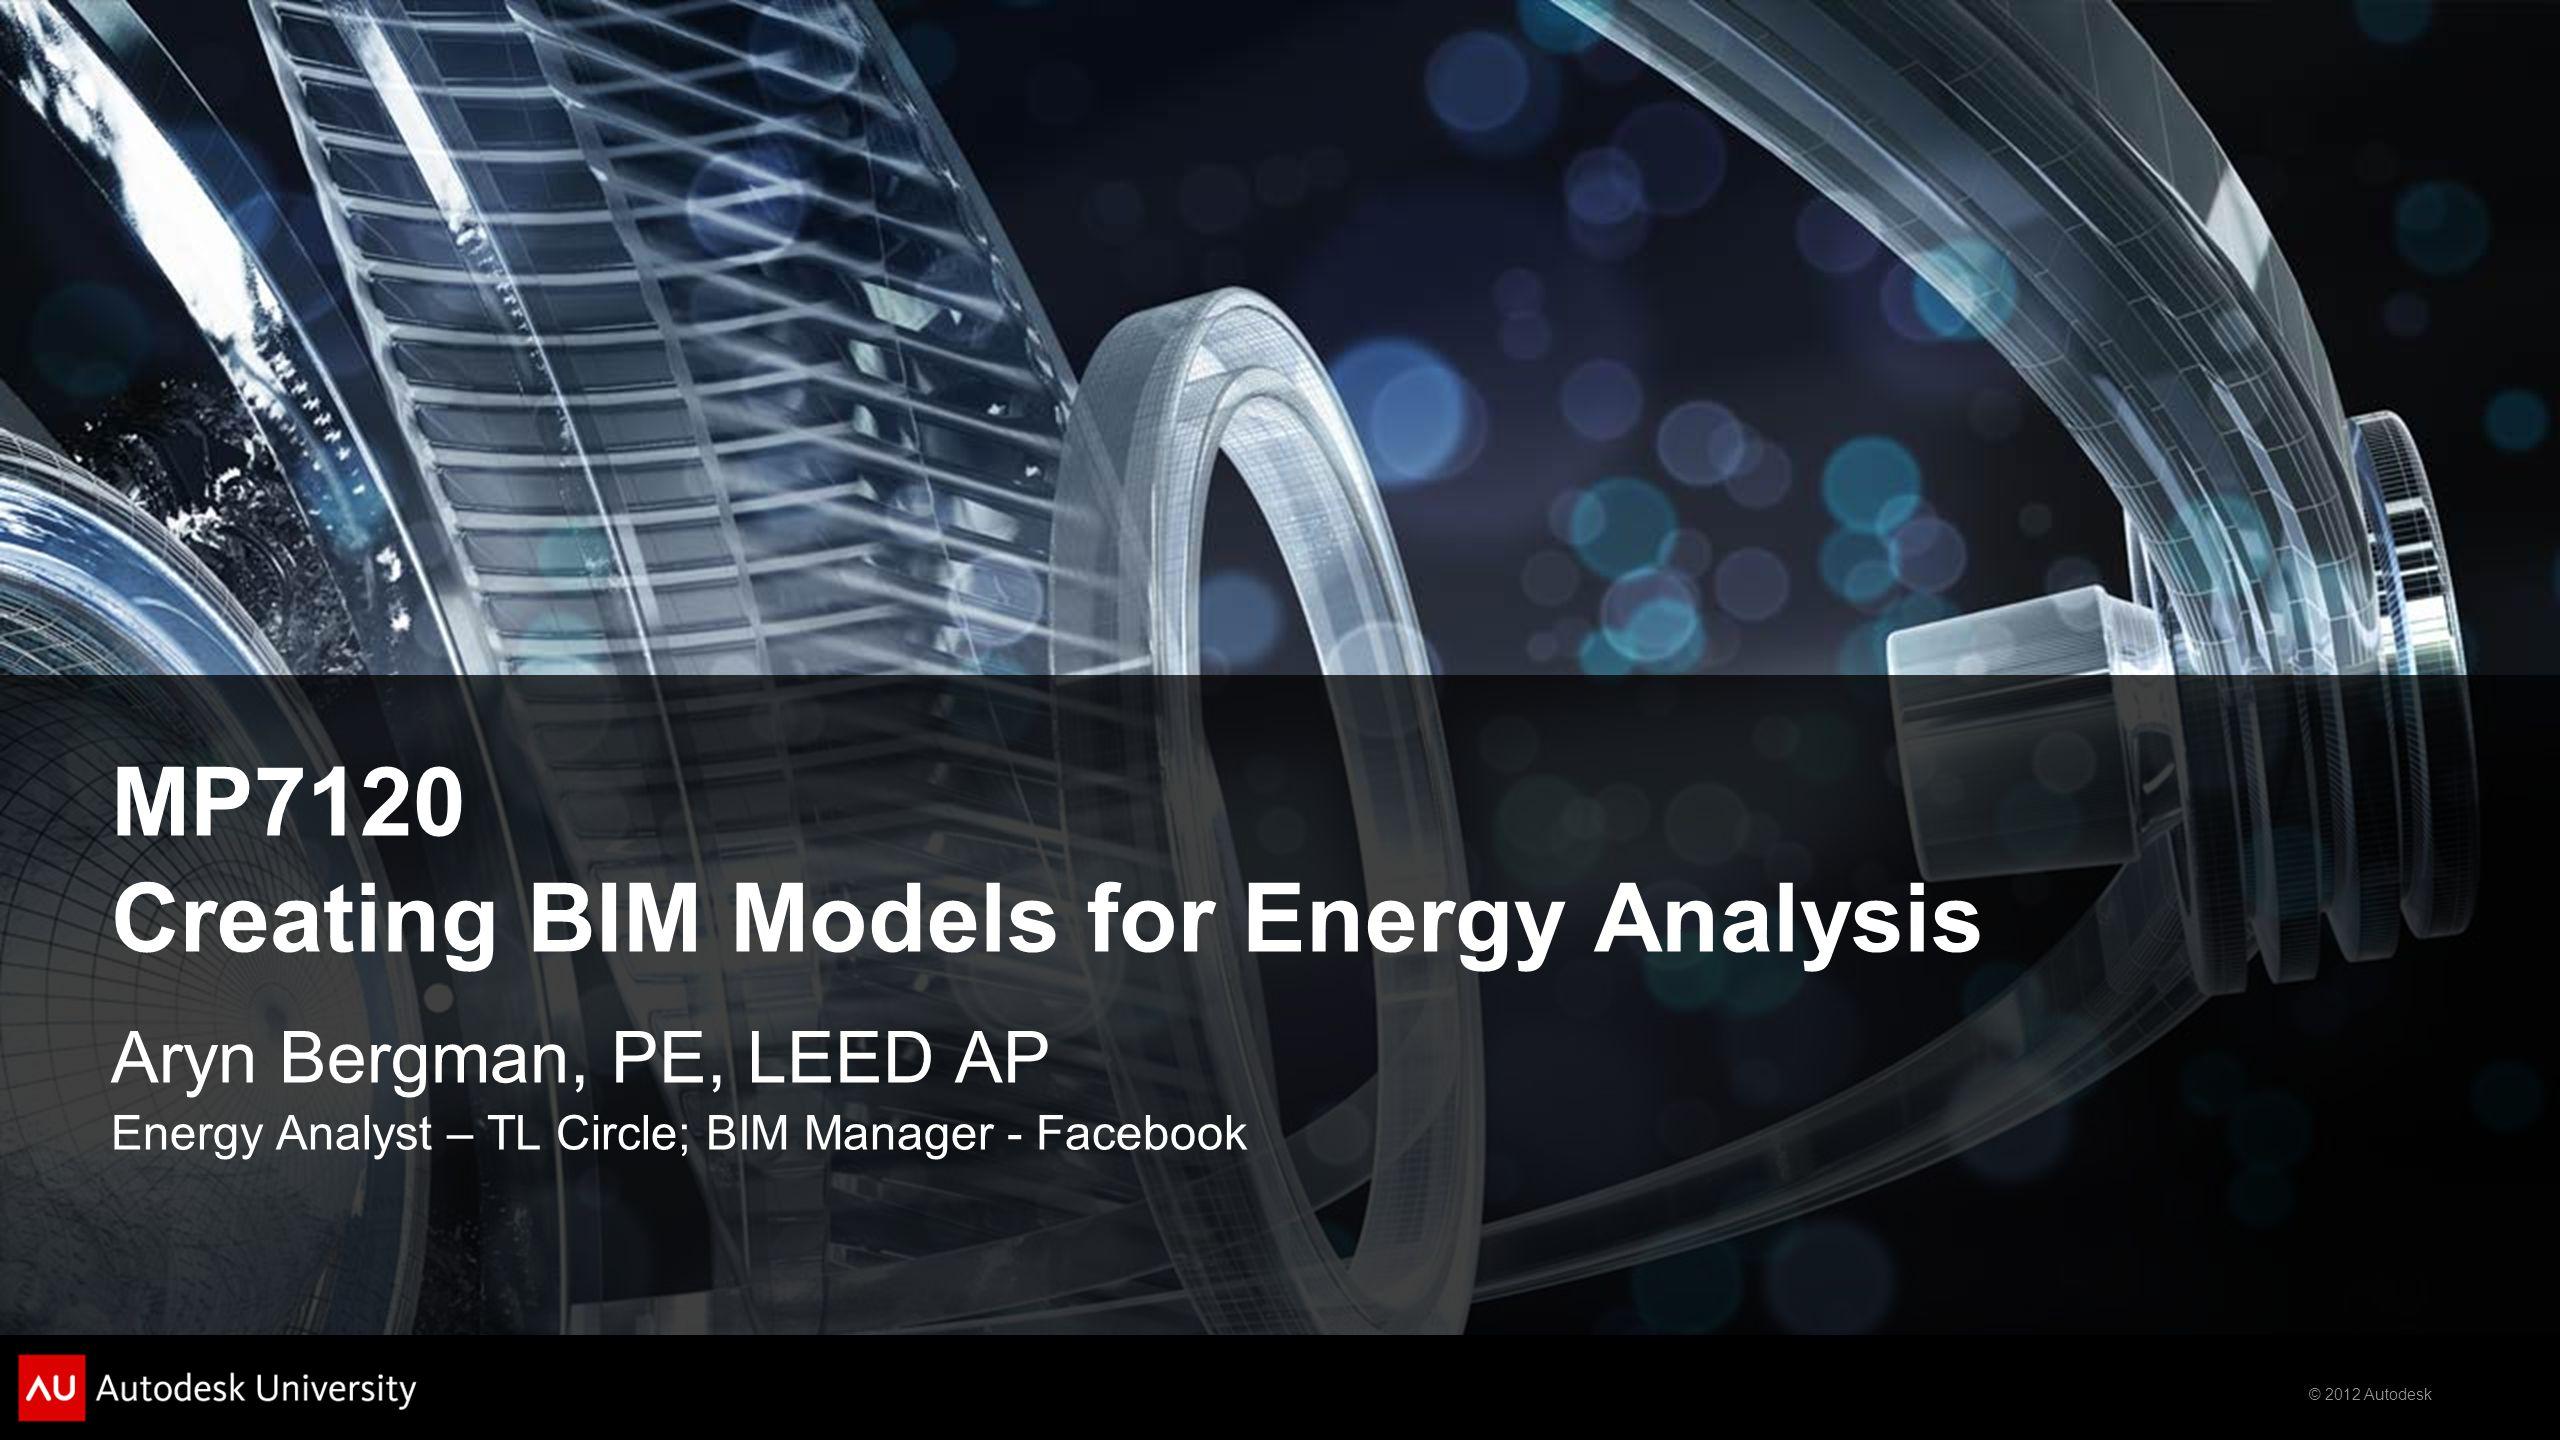 © 2012 Autodesk MP7120 Creating BIM Models for Energy Analysis Aryn Bergman, PE, LEED AP Energy Analyst – TL Circle; BIM Manager - Facebook